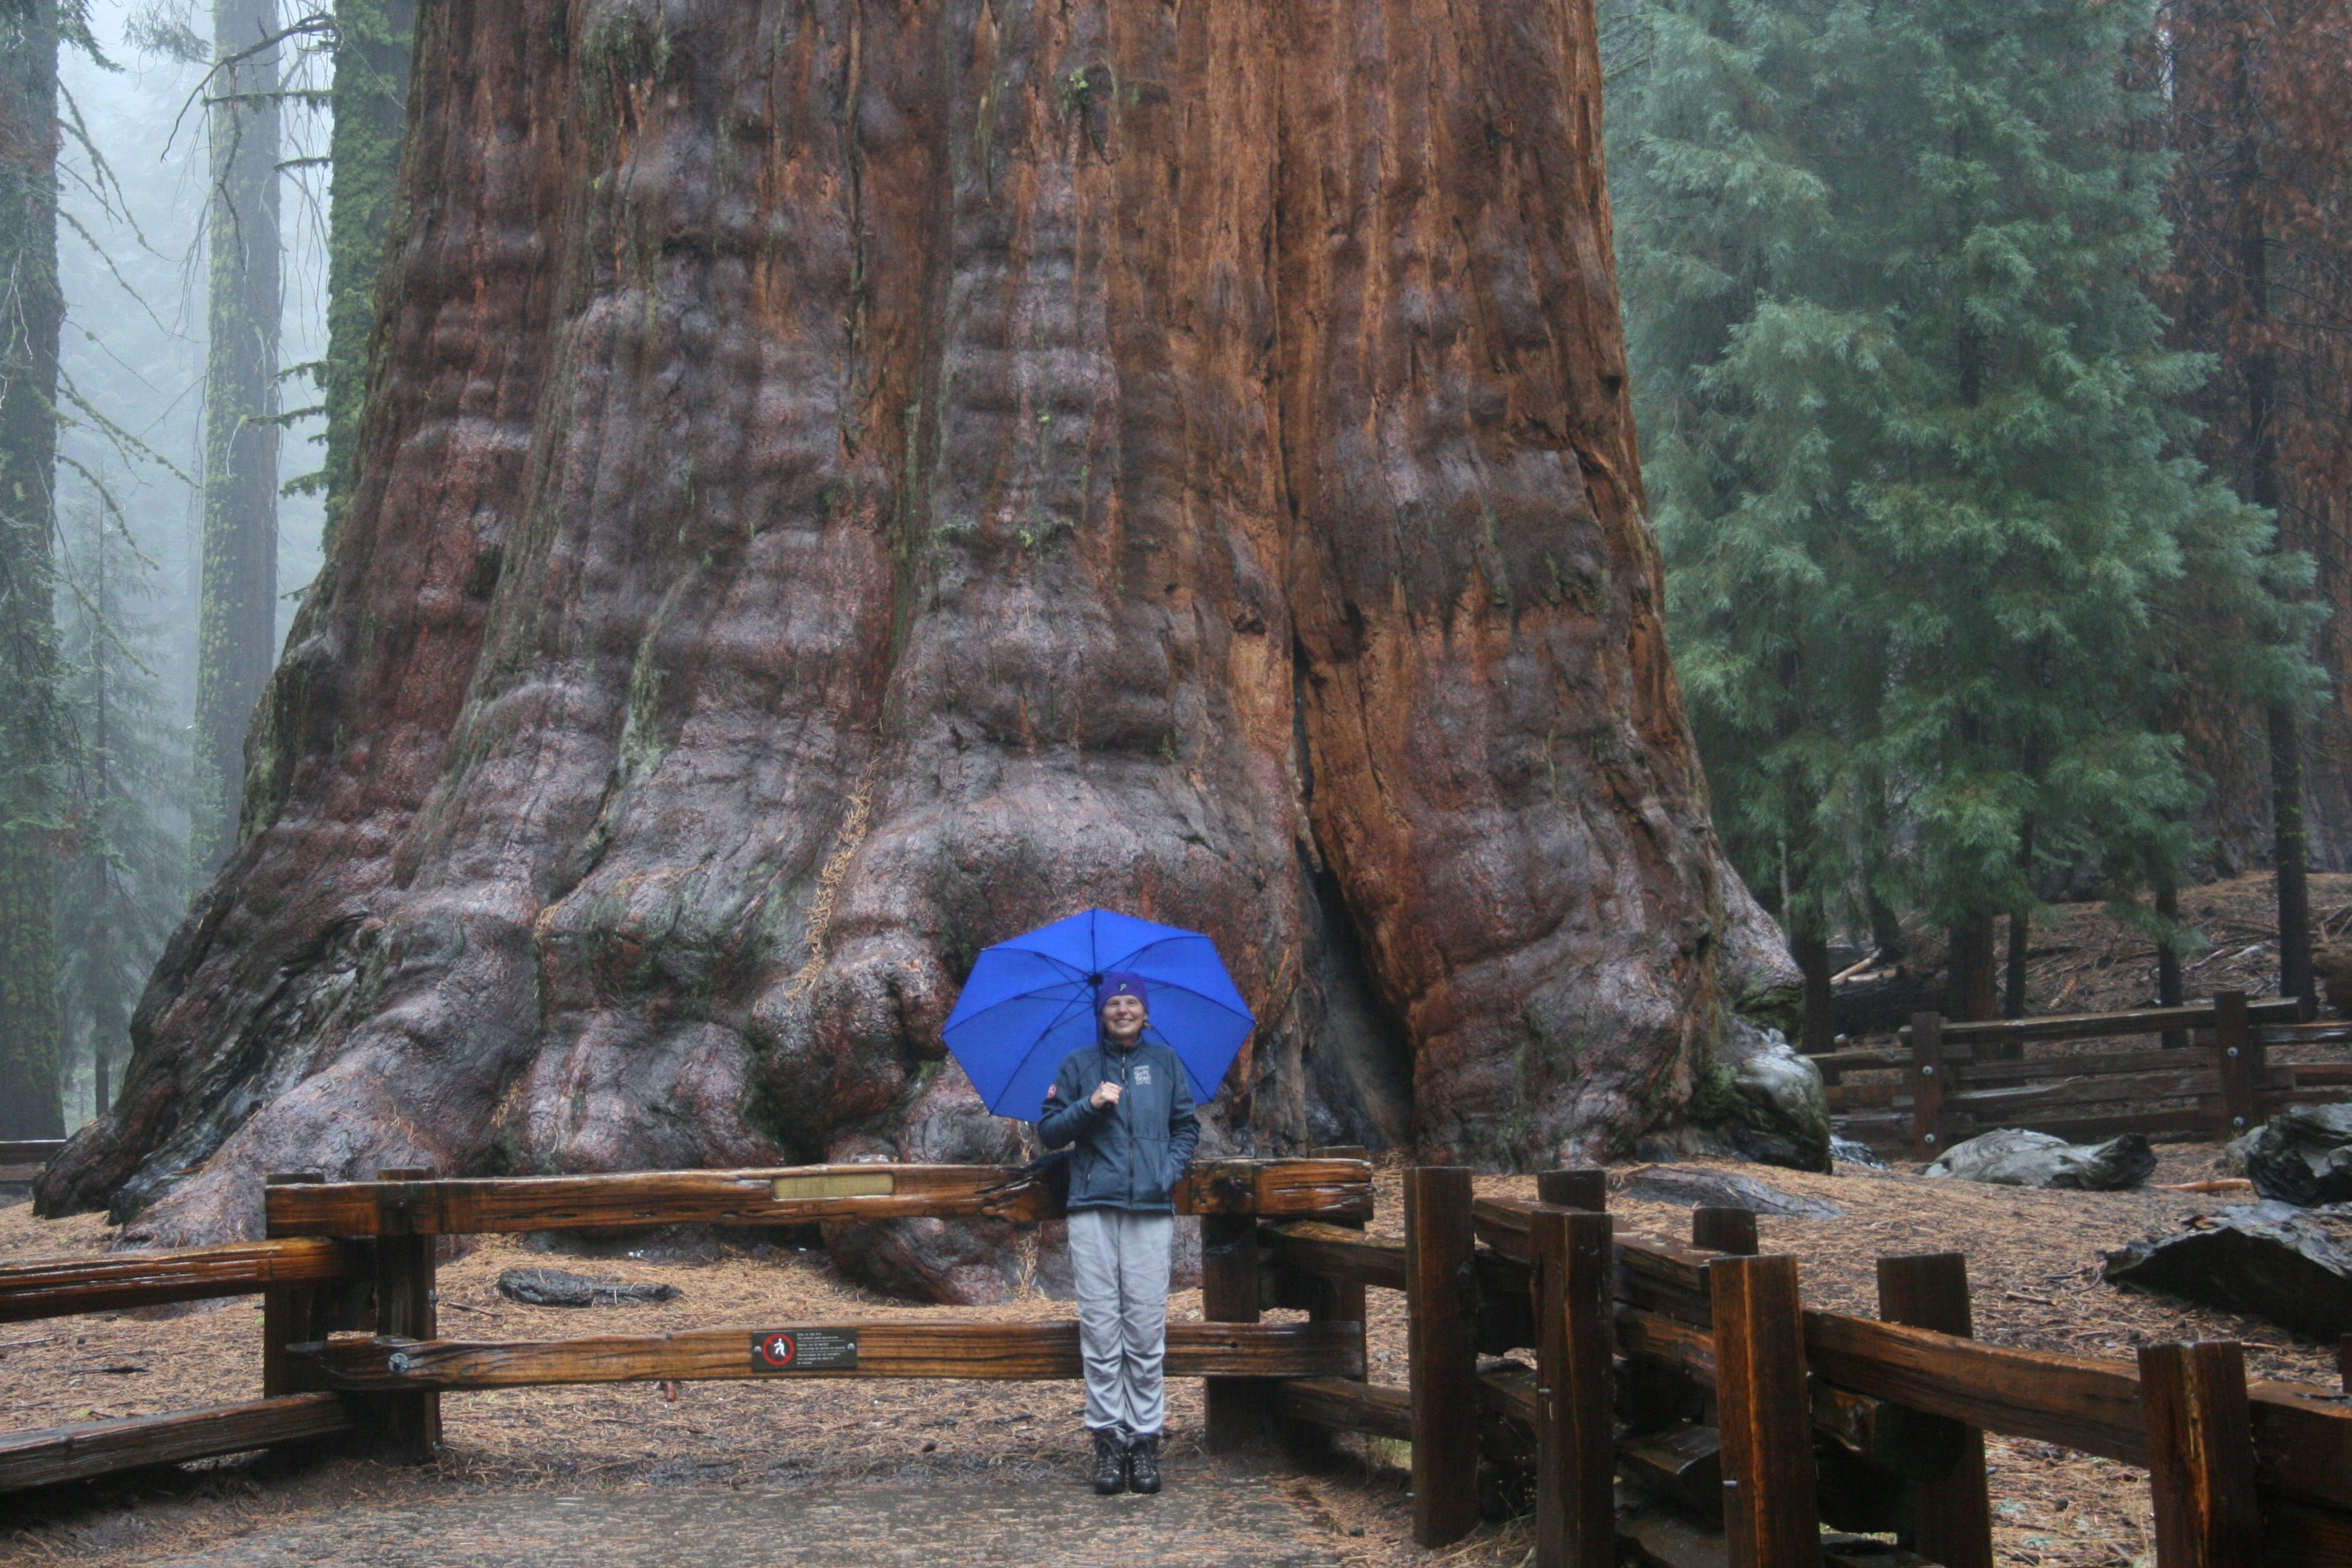 NP Sequoia - General Sherman Tree